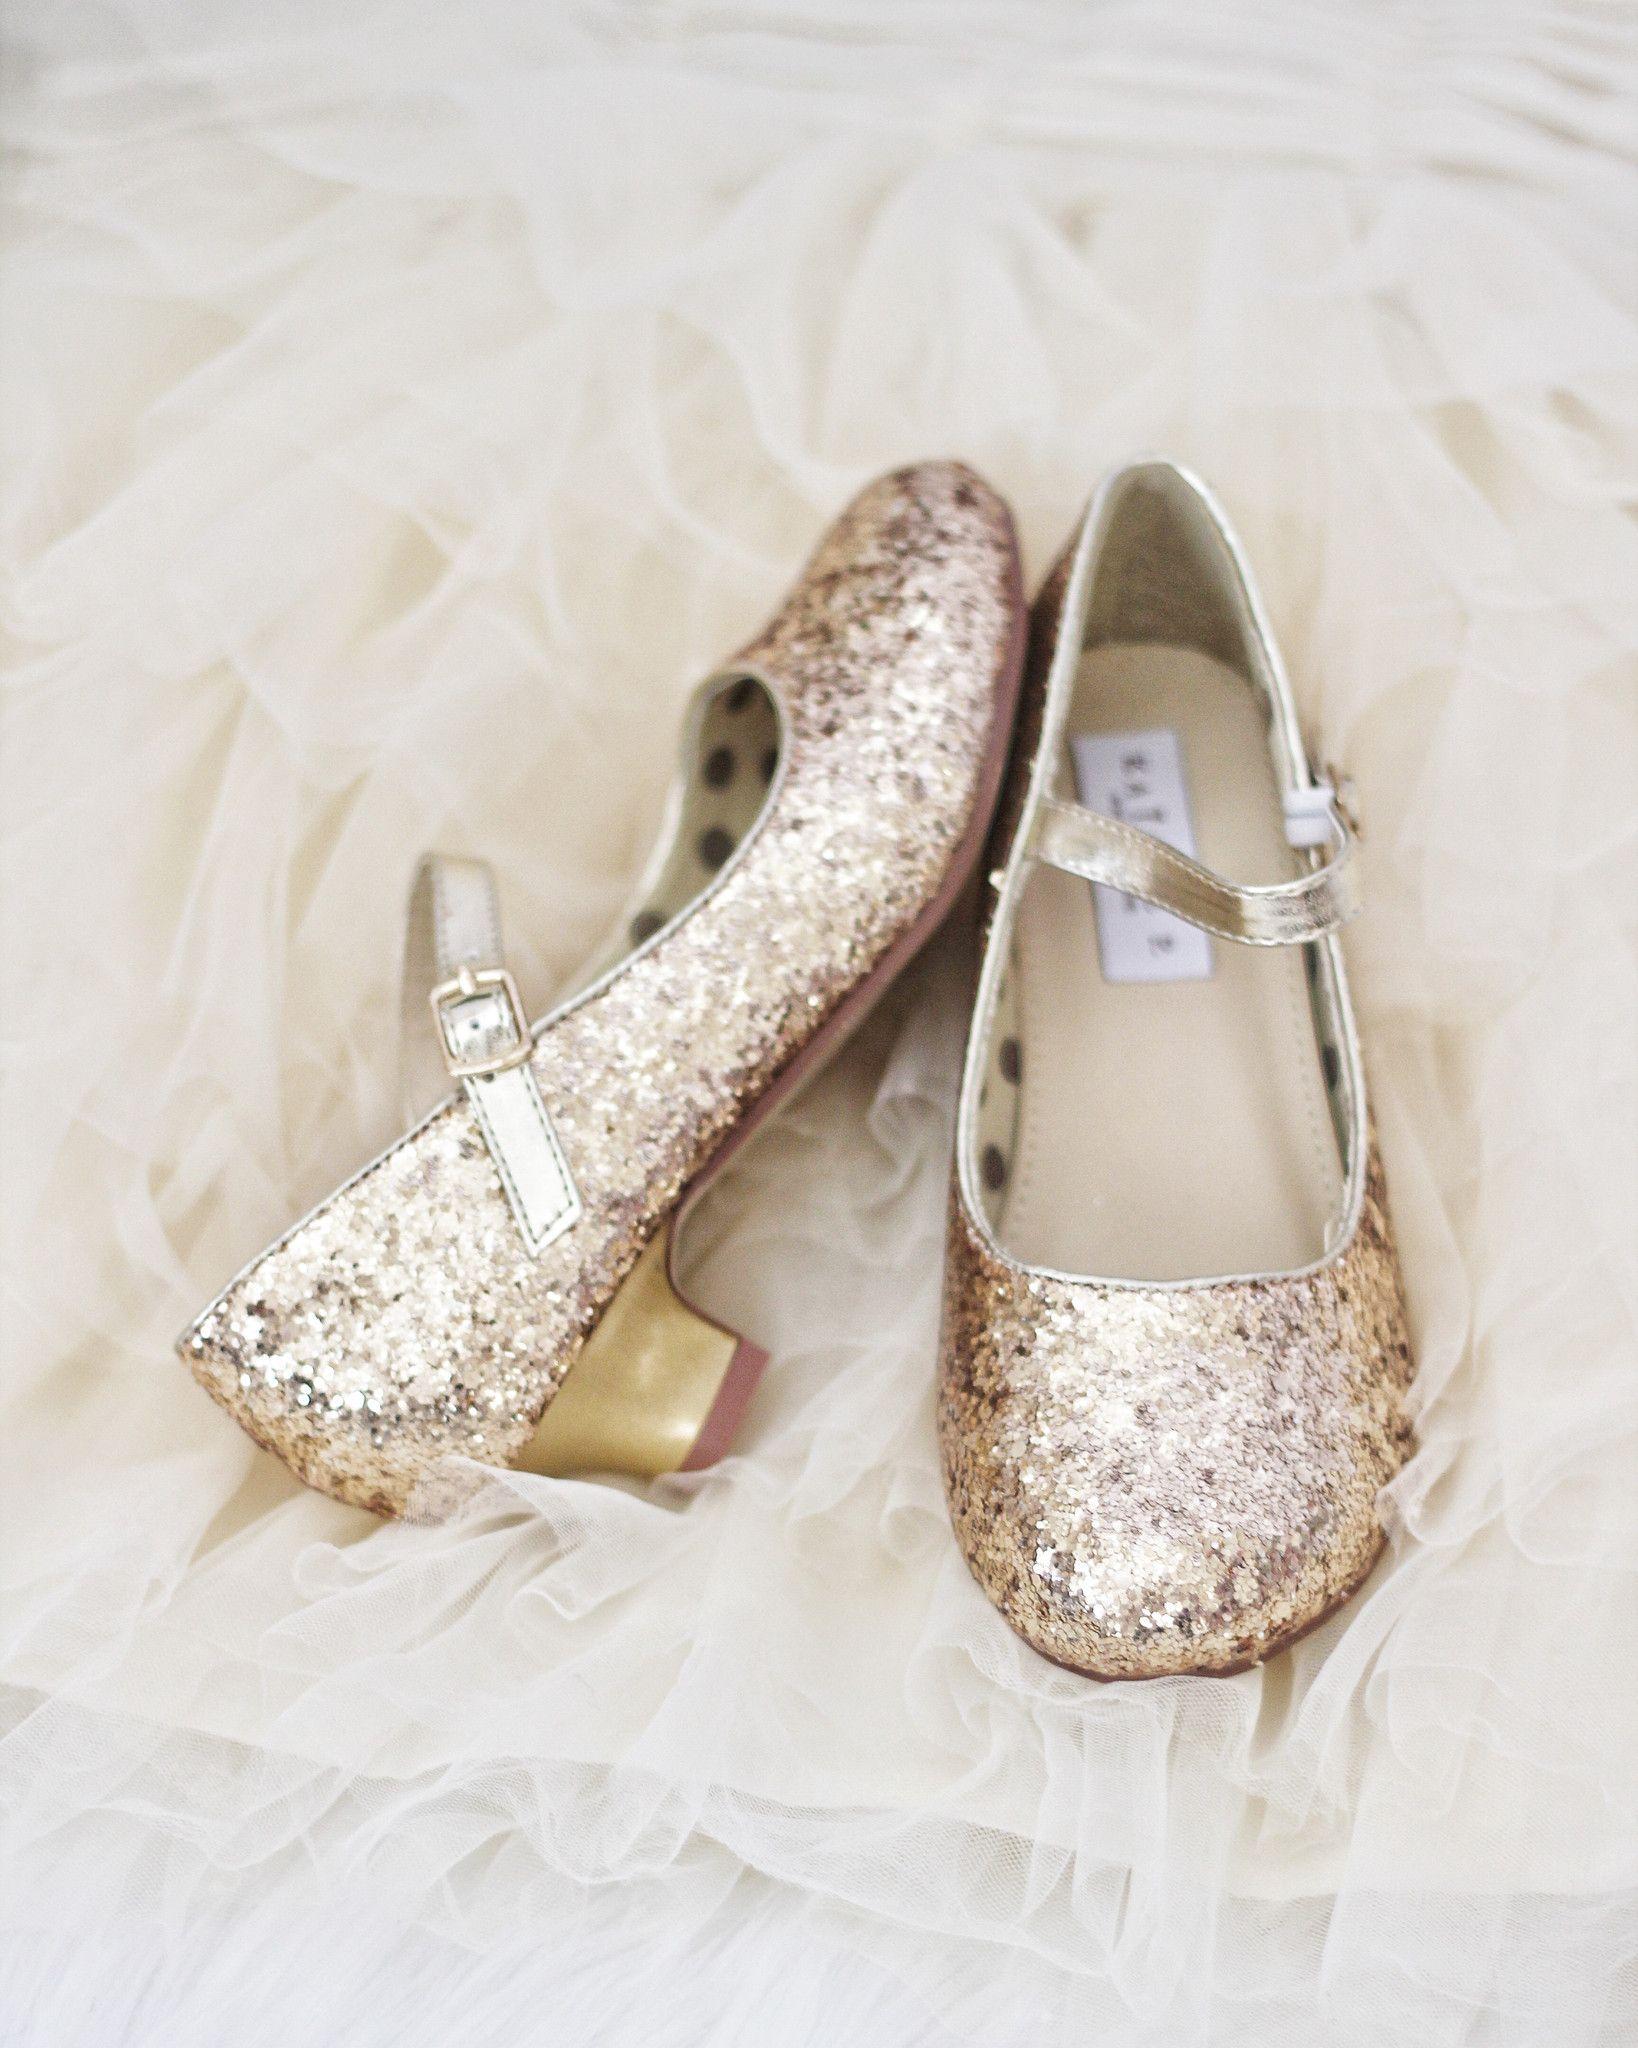 caee859ca7c Girls Glitter Heels - Allover GOLD Glitter Maryjane Heels